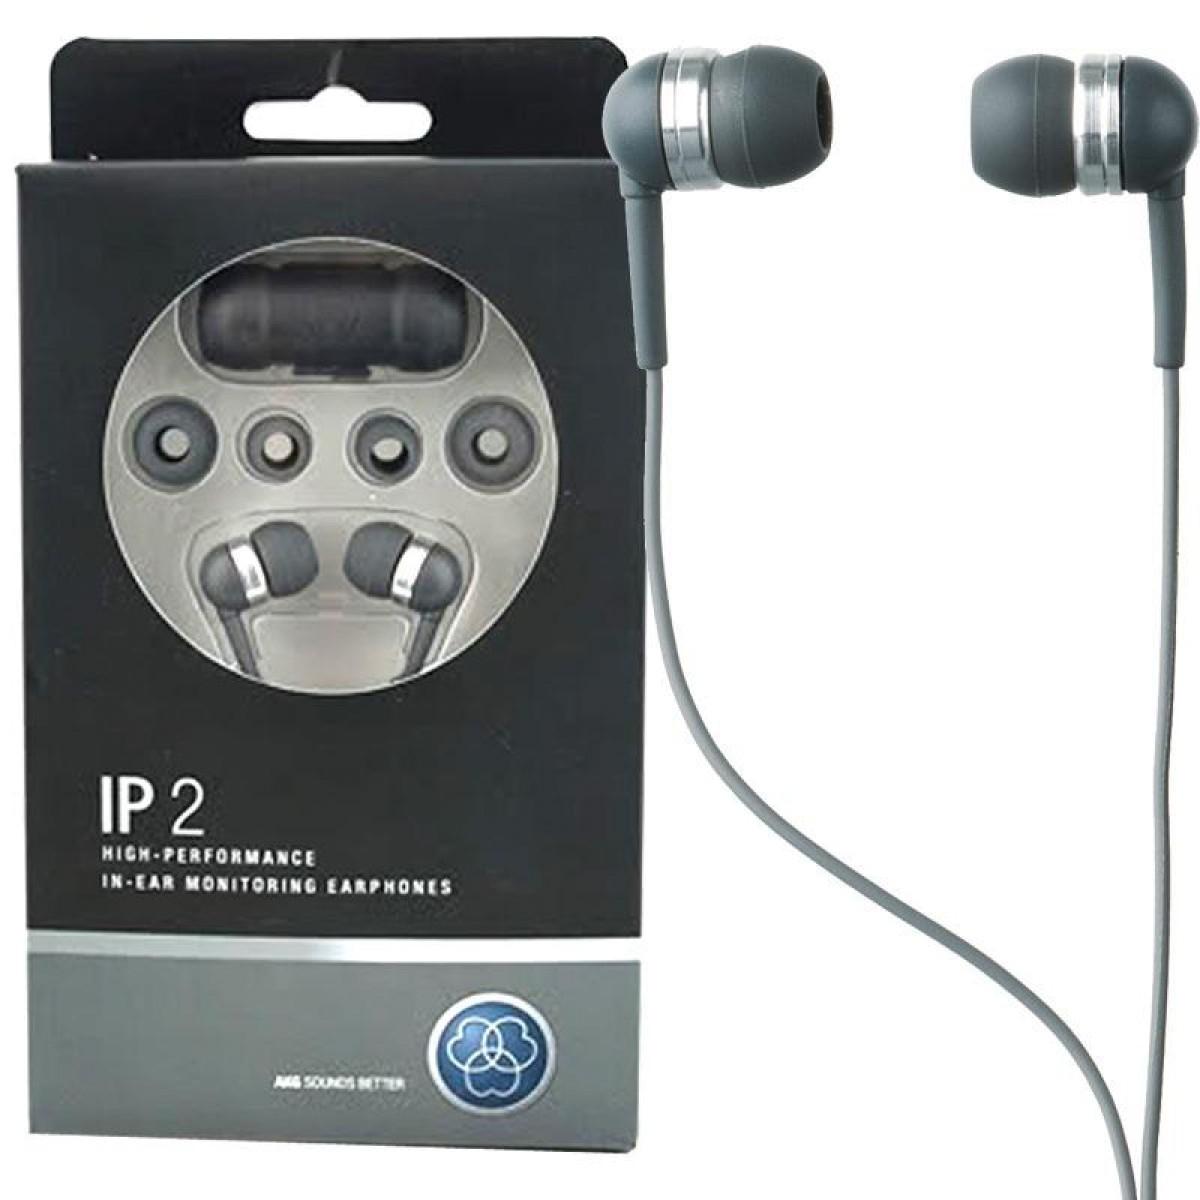 Fone de Ouvido Auricular IP2 Earphone - AKG